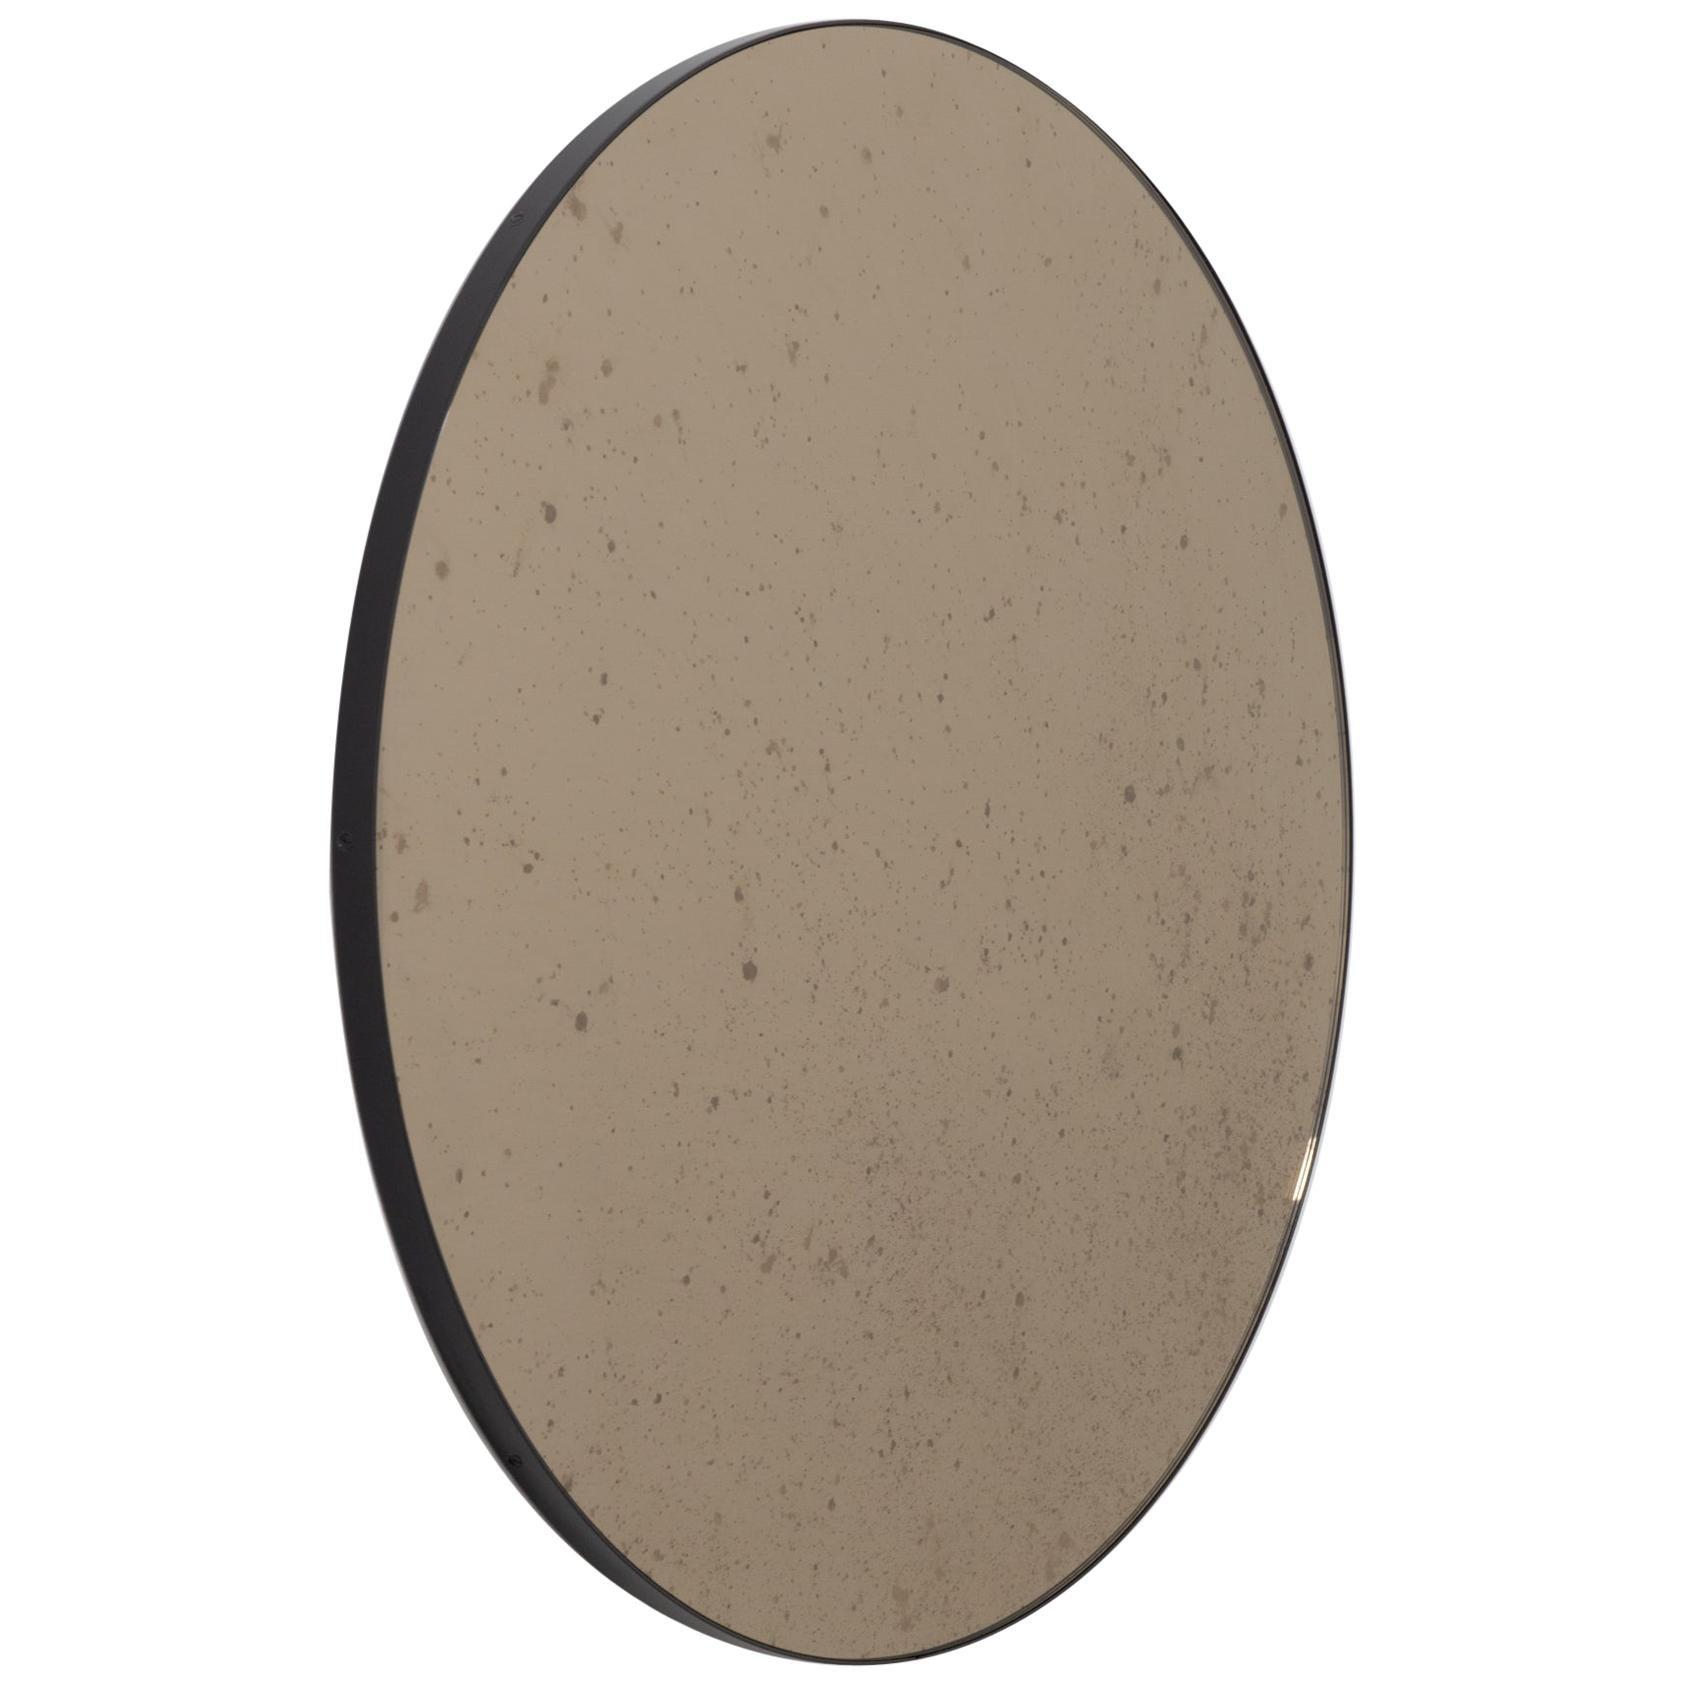 Orbis™ Antiqued Bronze Tinted Modernist Round Mirror with Black Frame - Large